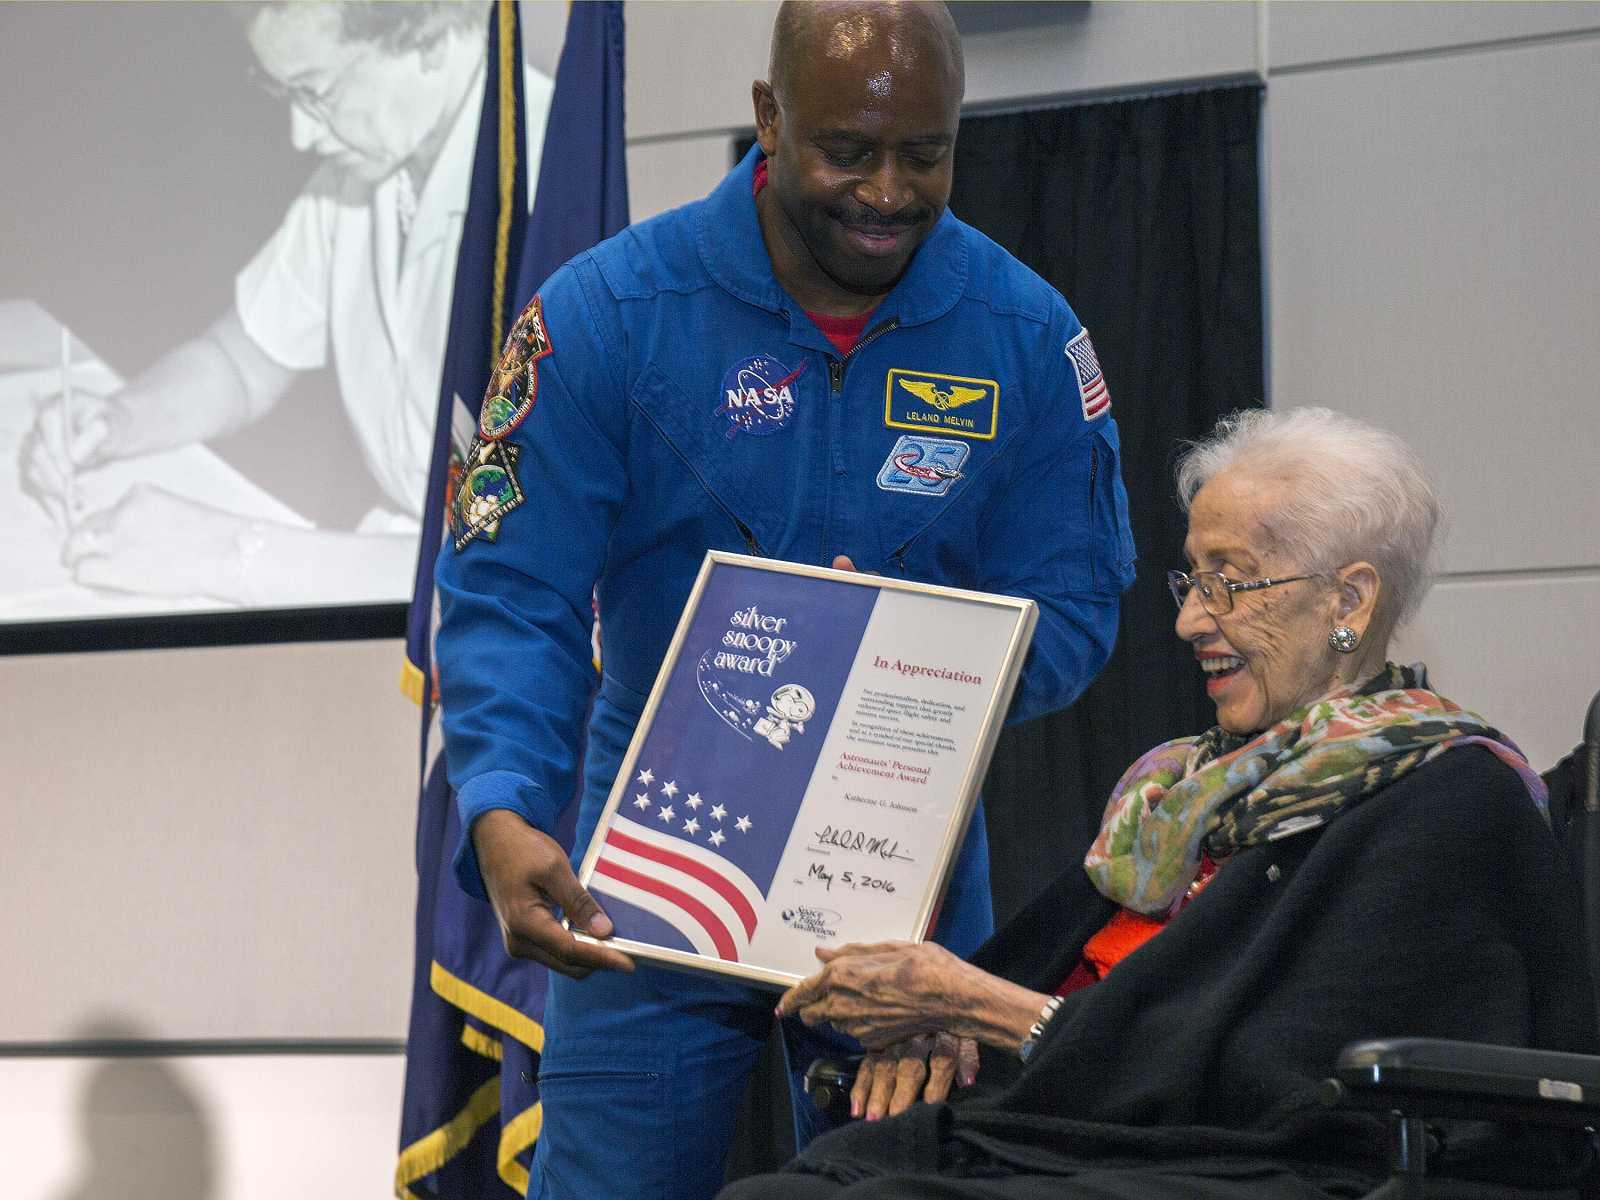 Katherine Johnson, primera mujer en la NASA